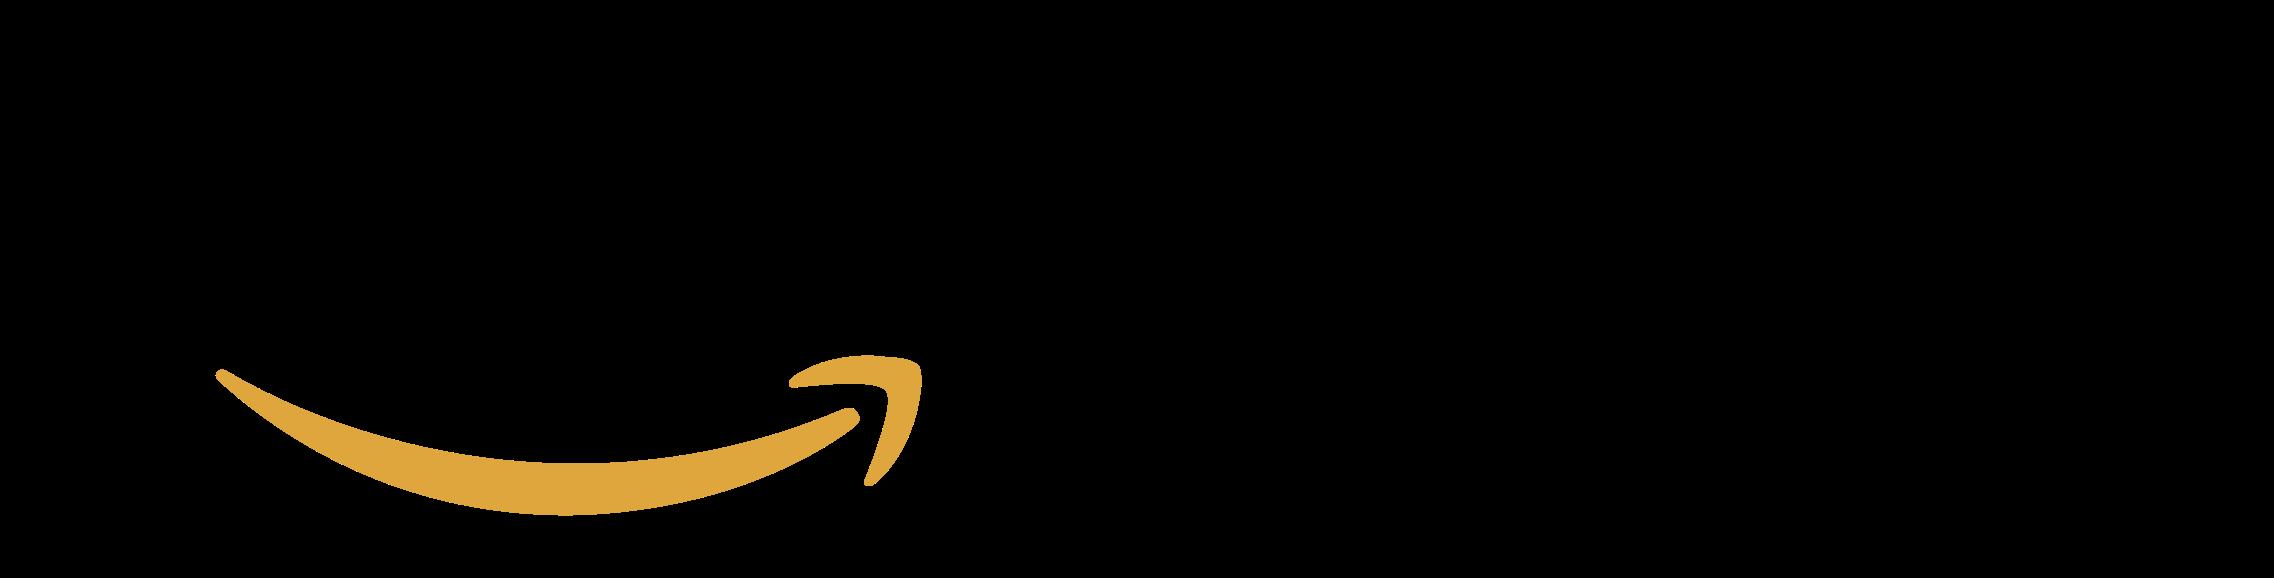 amazon-co-uk-logo-png-transparent